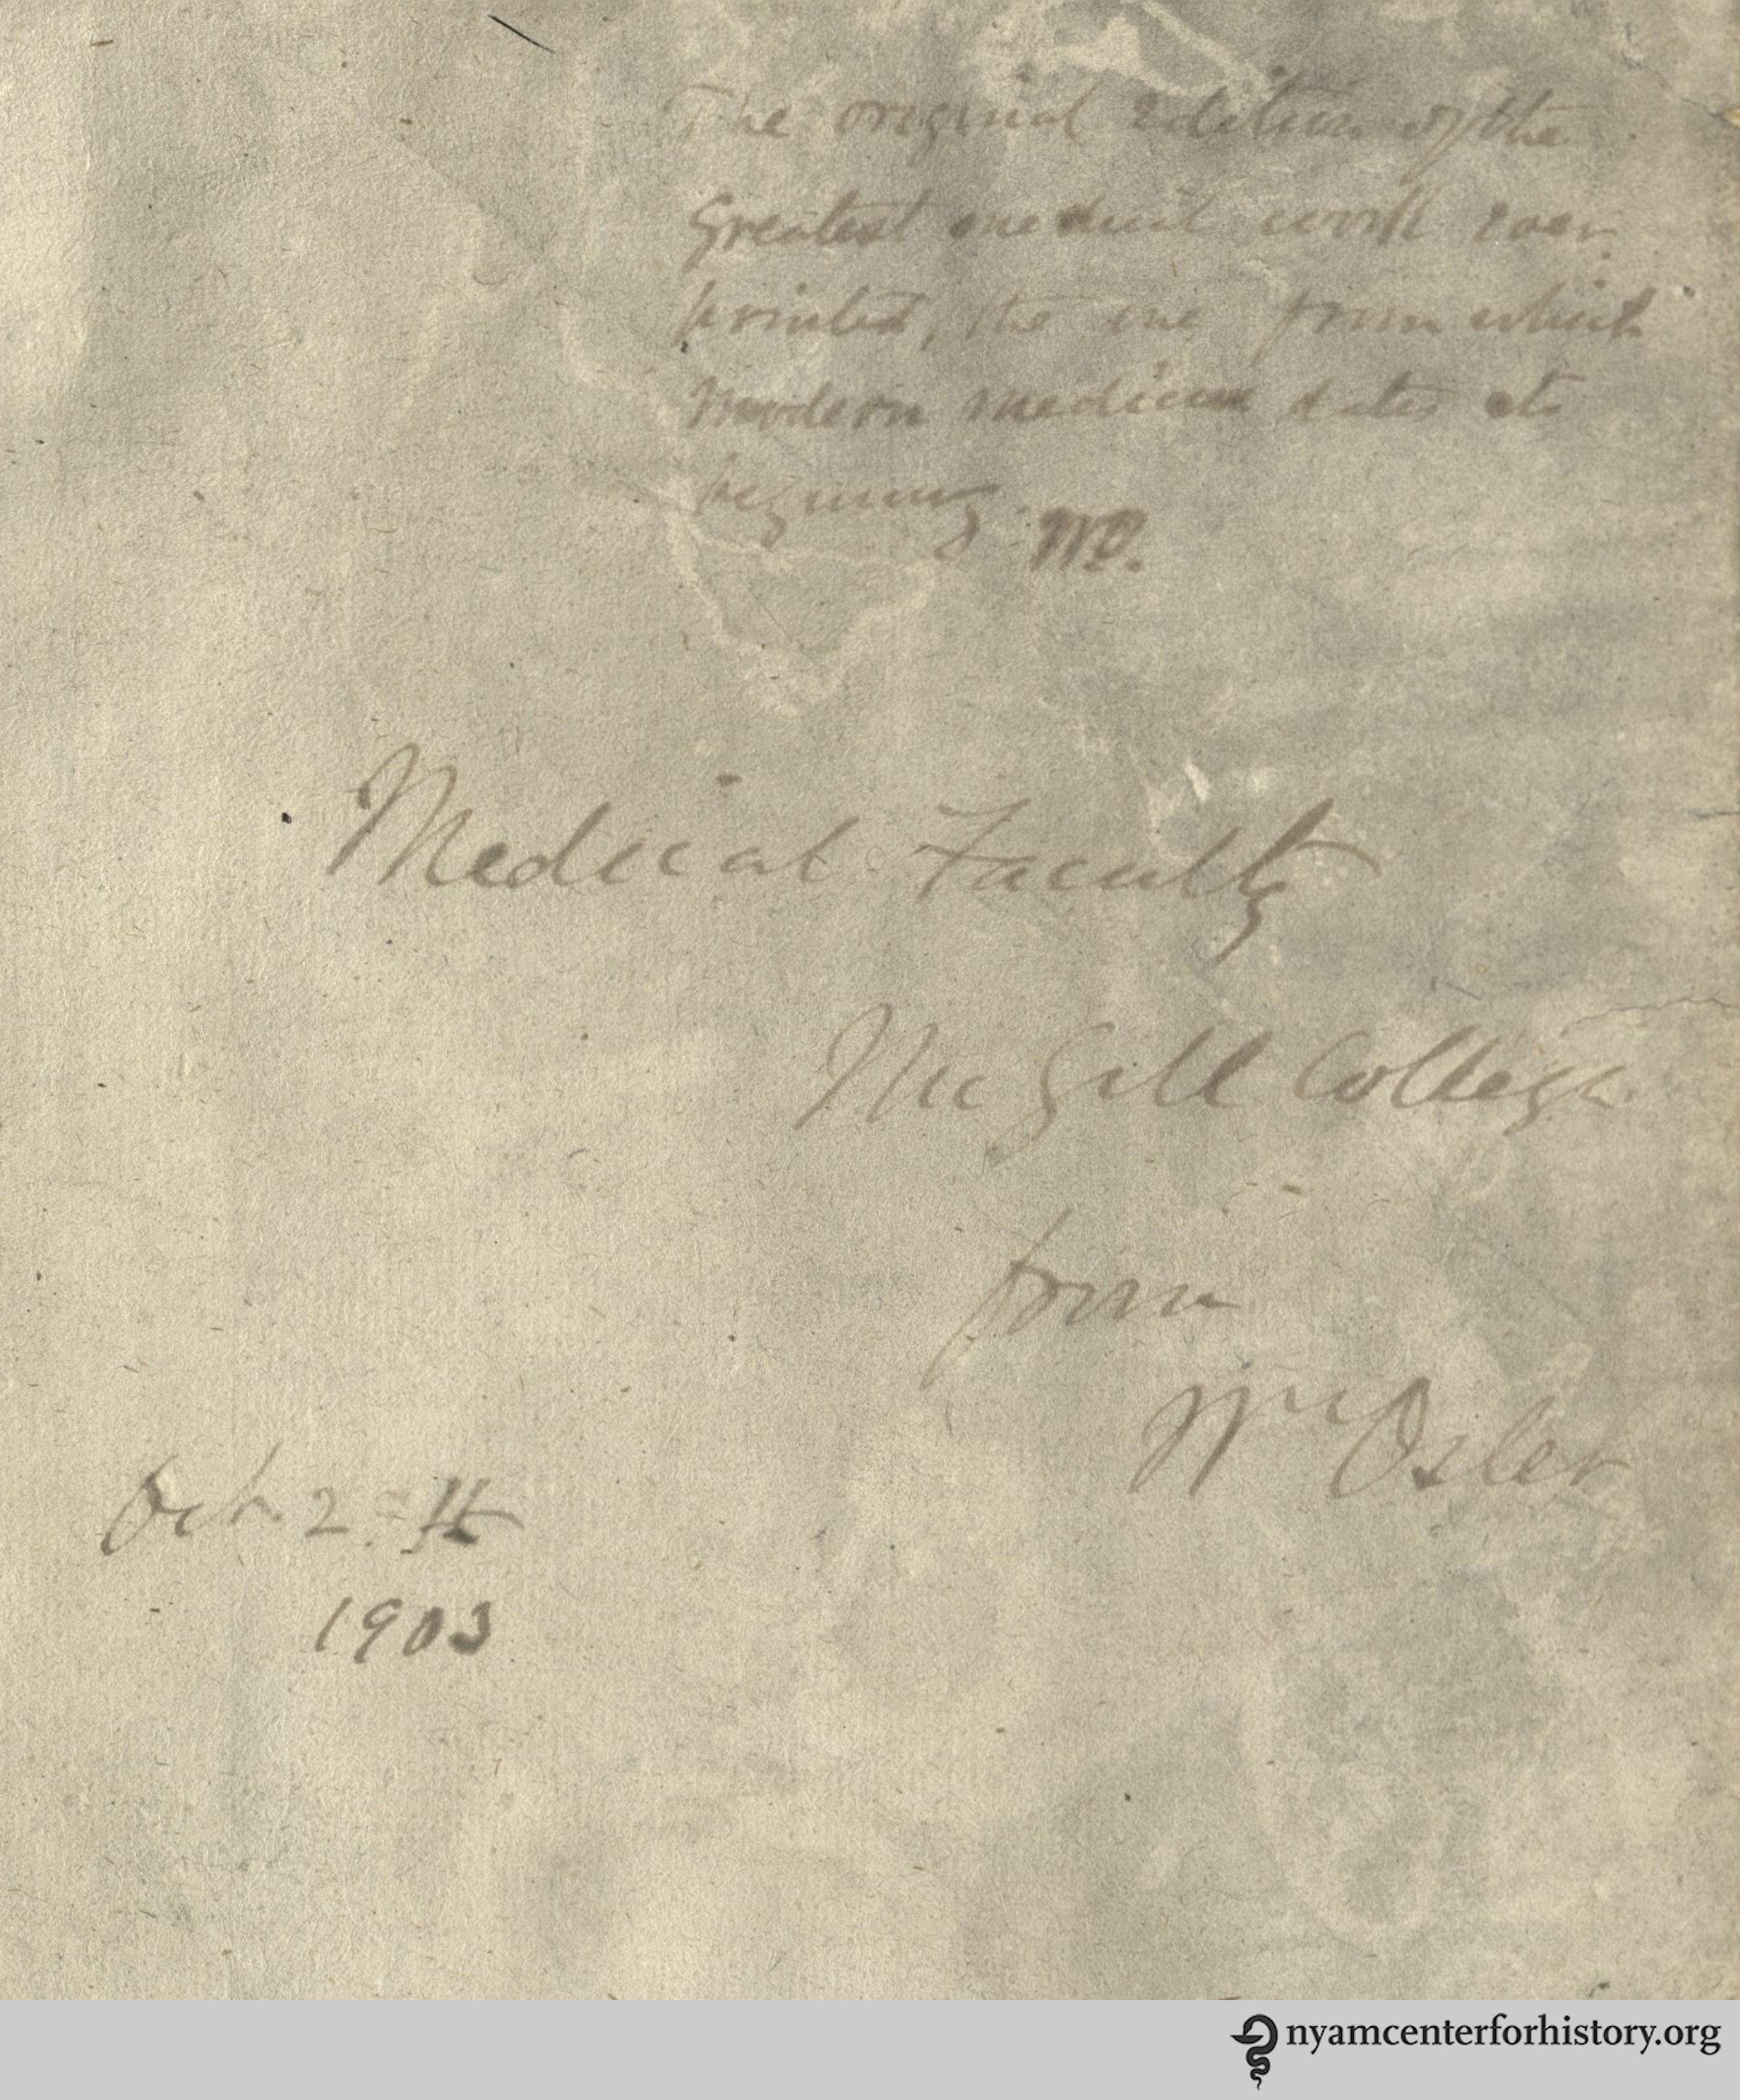 Vesalius1543_WOinscription_watermark